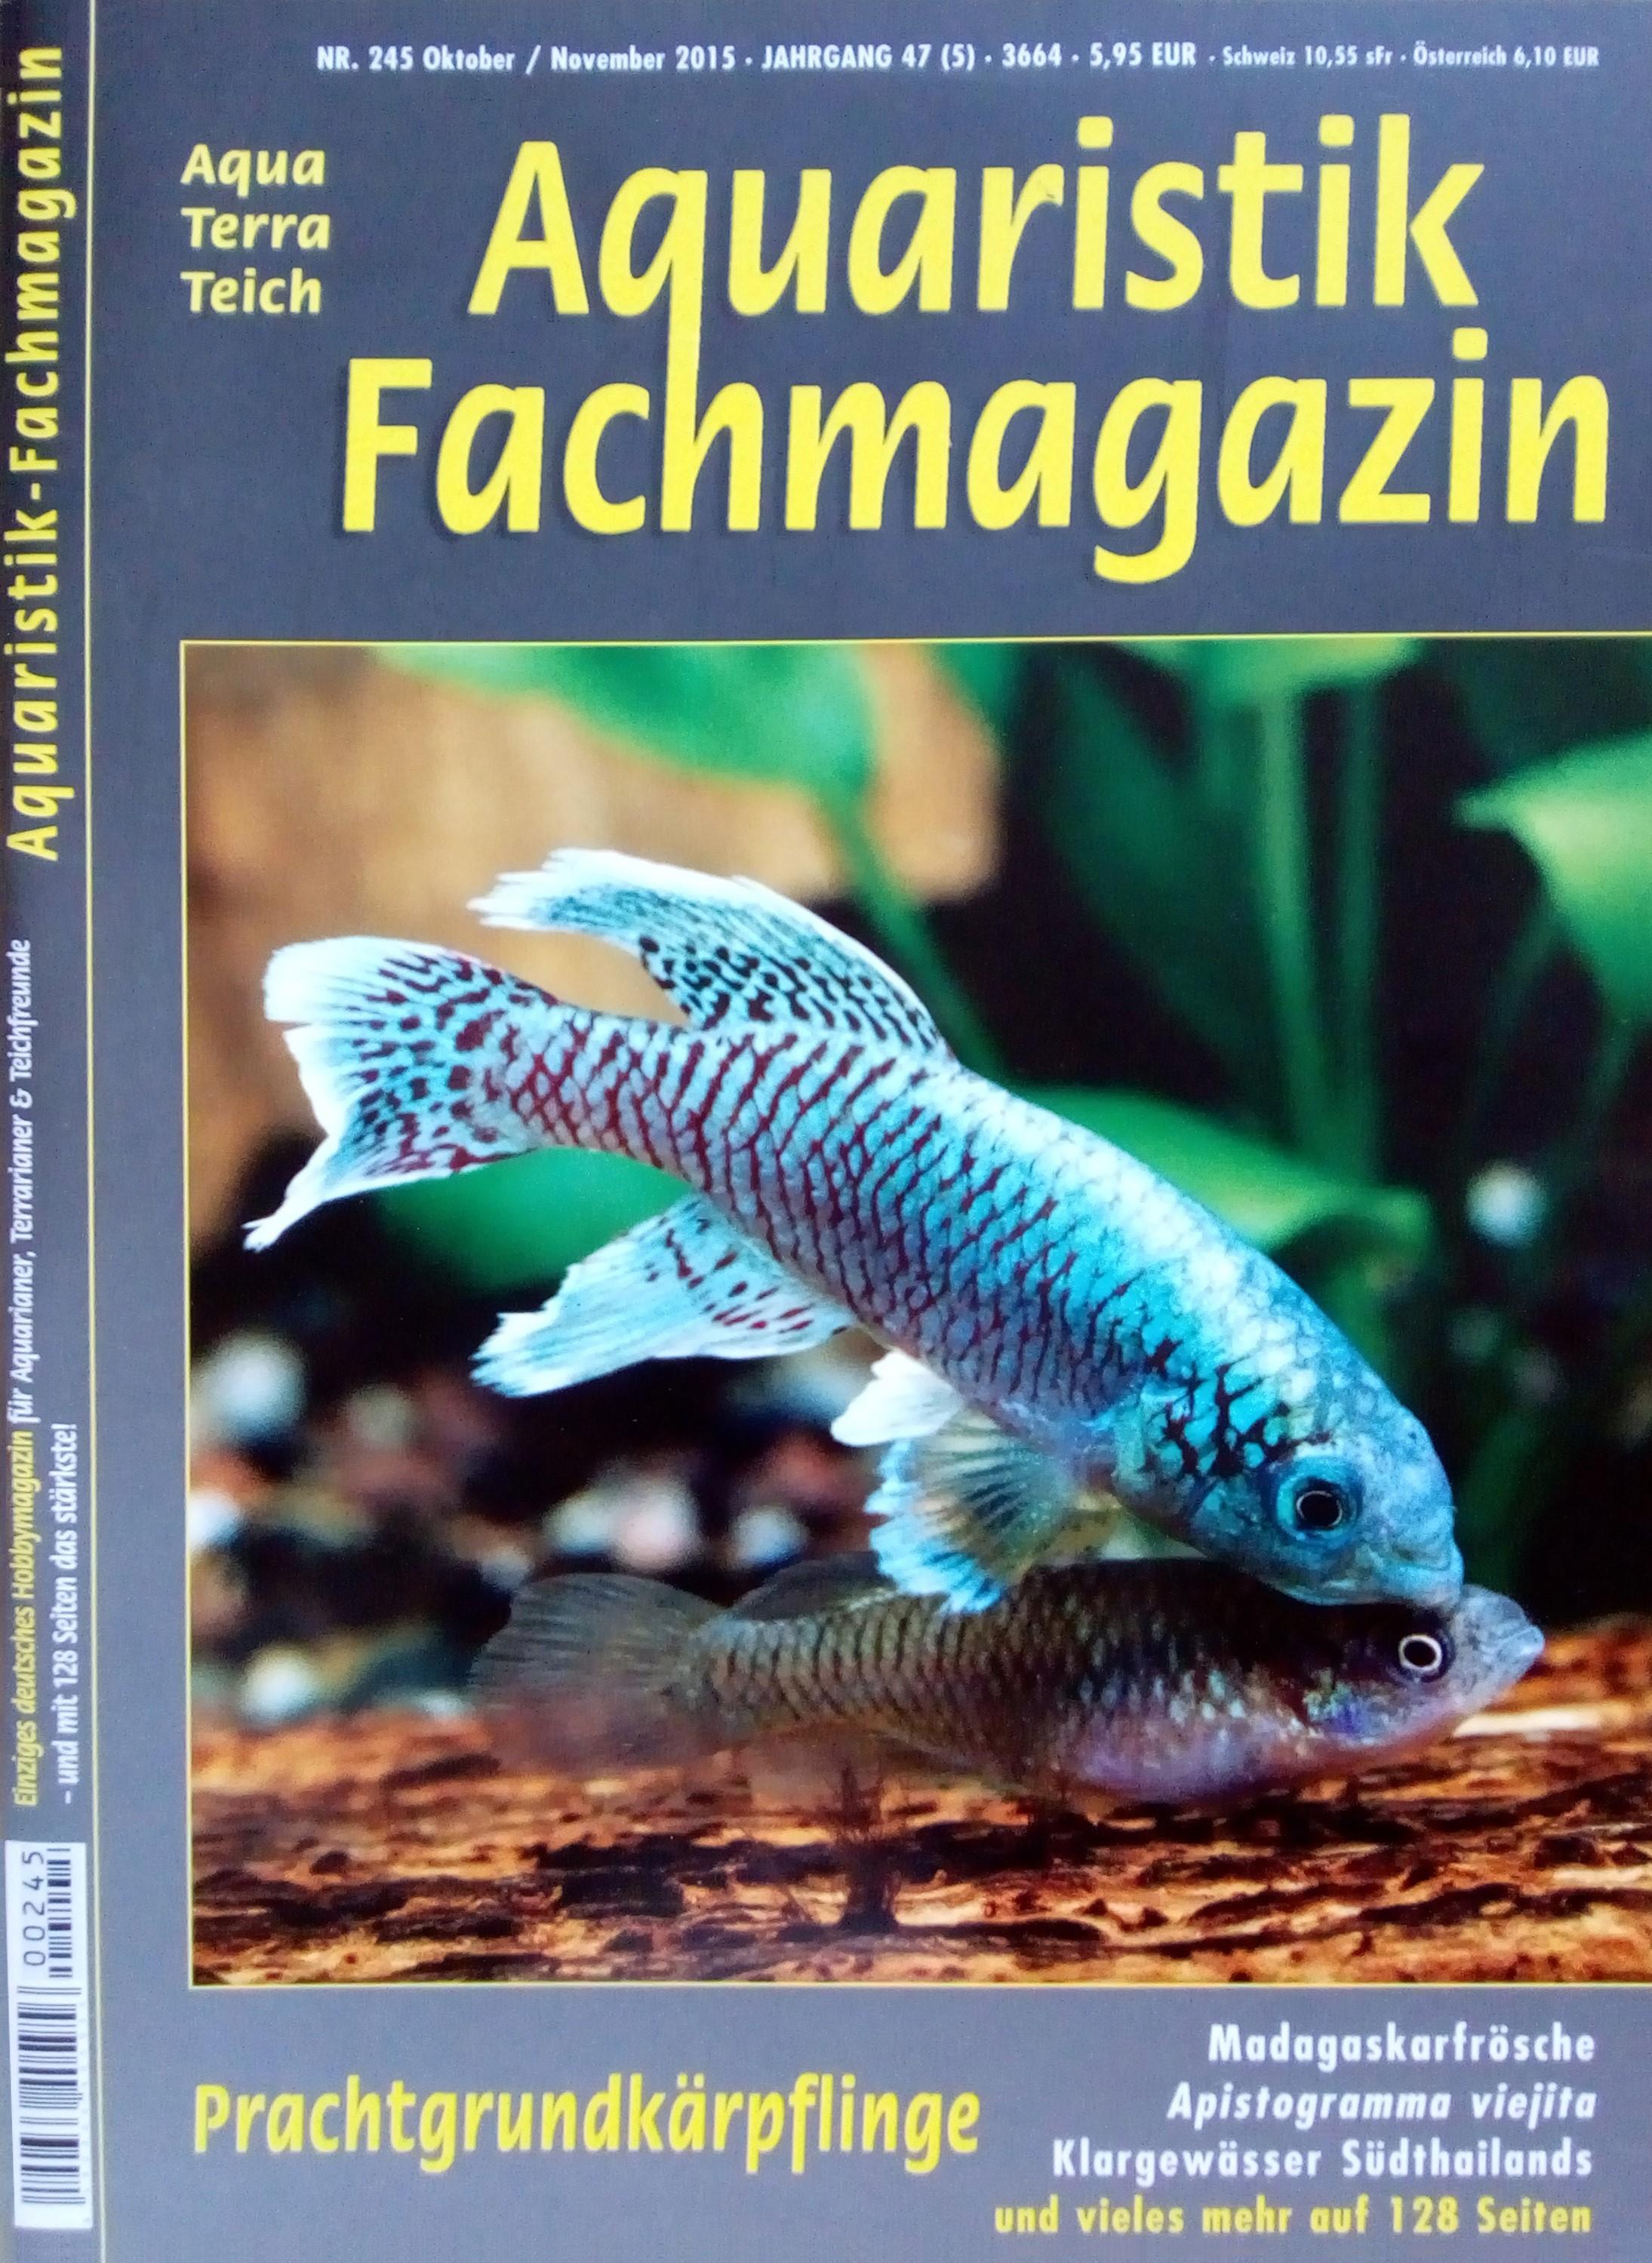 Aquaristik-Fachmagazin, Ausgabe 245 (Okt./Nov. 2015)